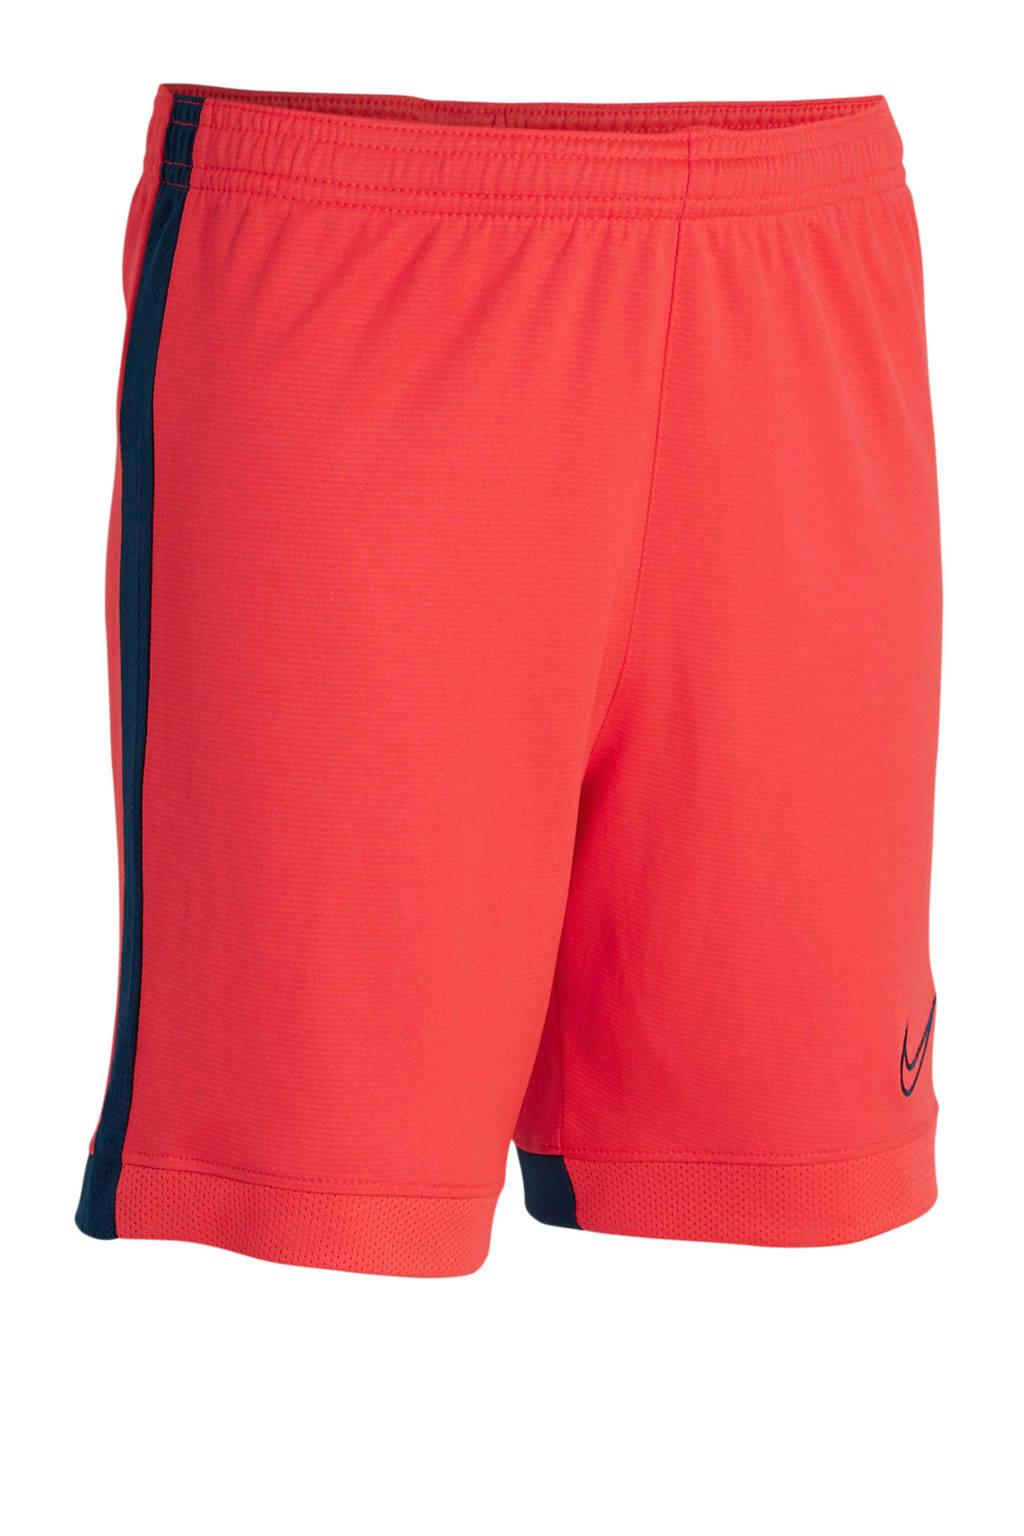 Nike   voetbalshort rood/blauw, Rood/blauw